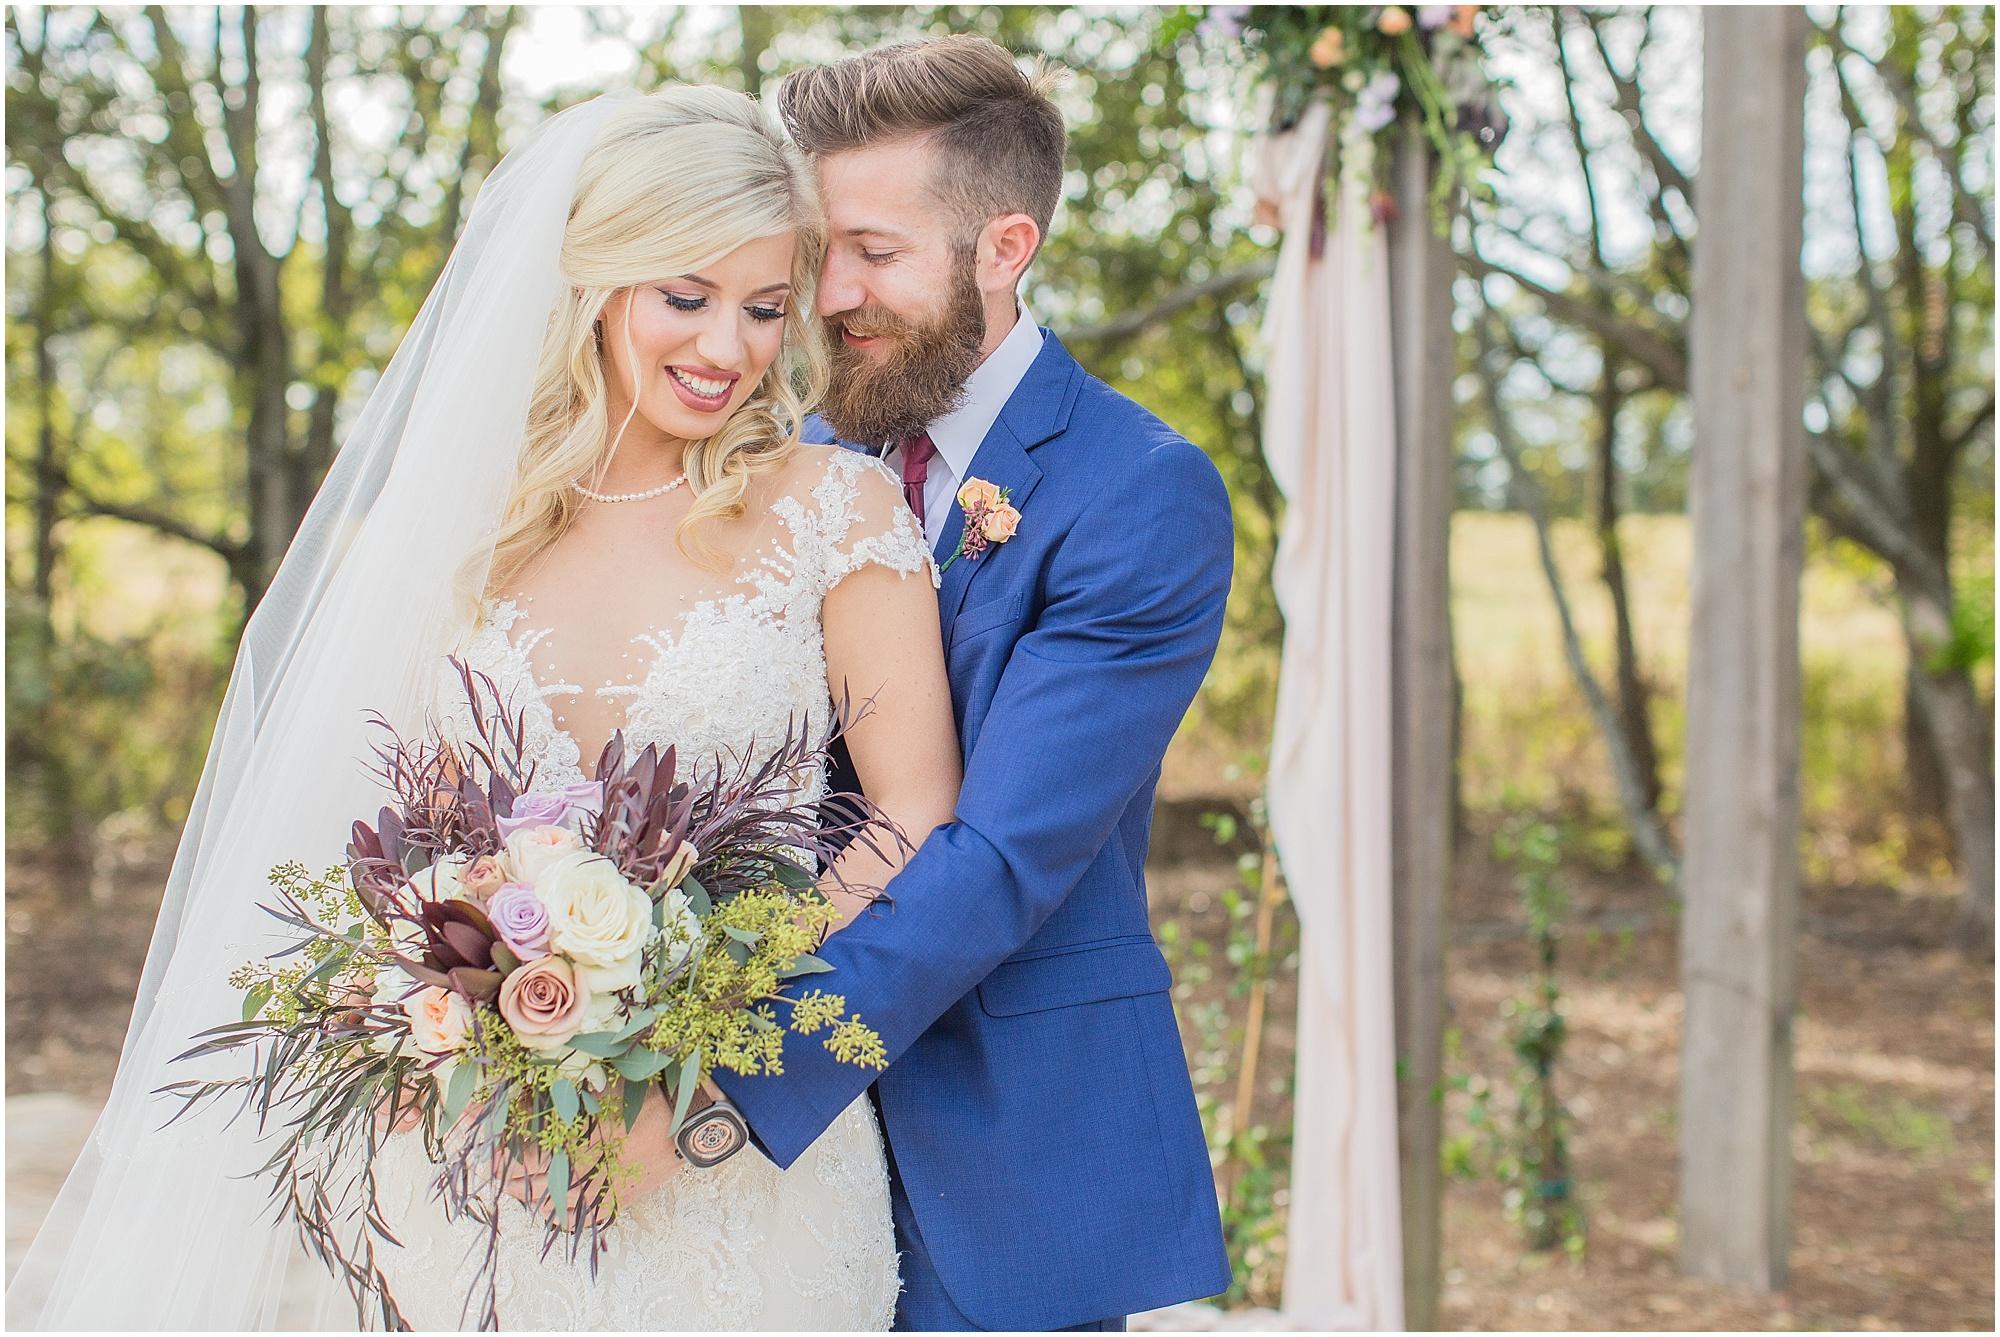 fall-wedding-bridlewood-of-madison-mississippi_0028.jpg